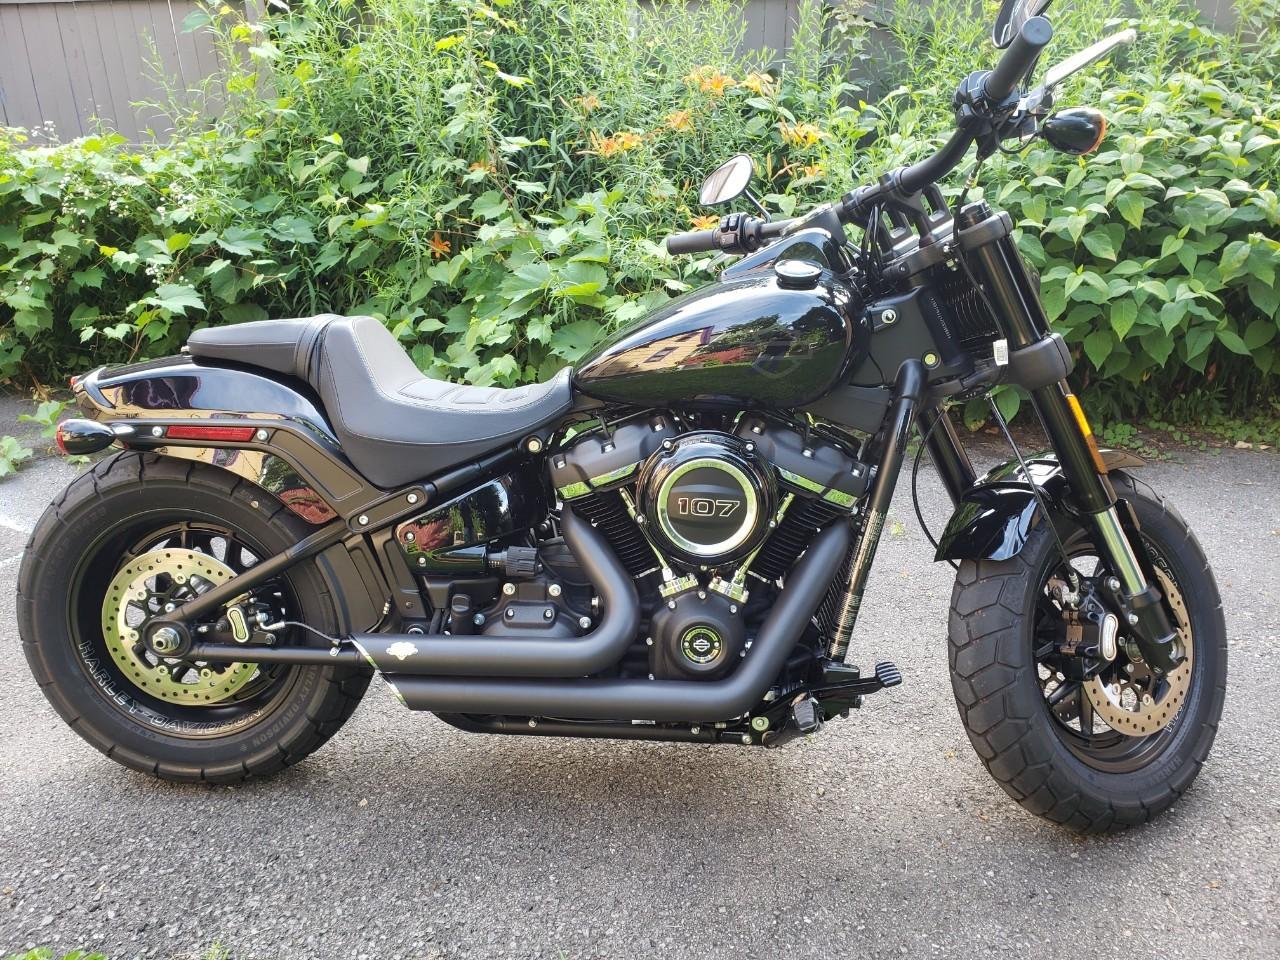 Rochester, NY - Harley-Davidson For Sale - Harley-Davidson